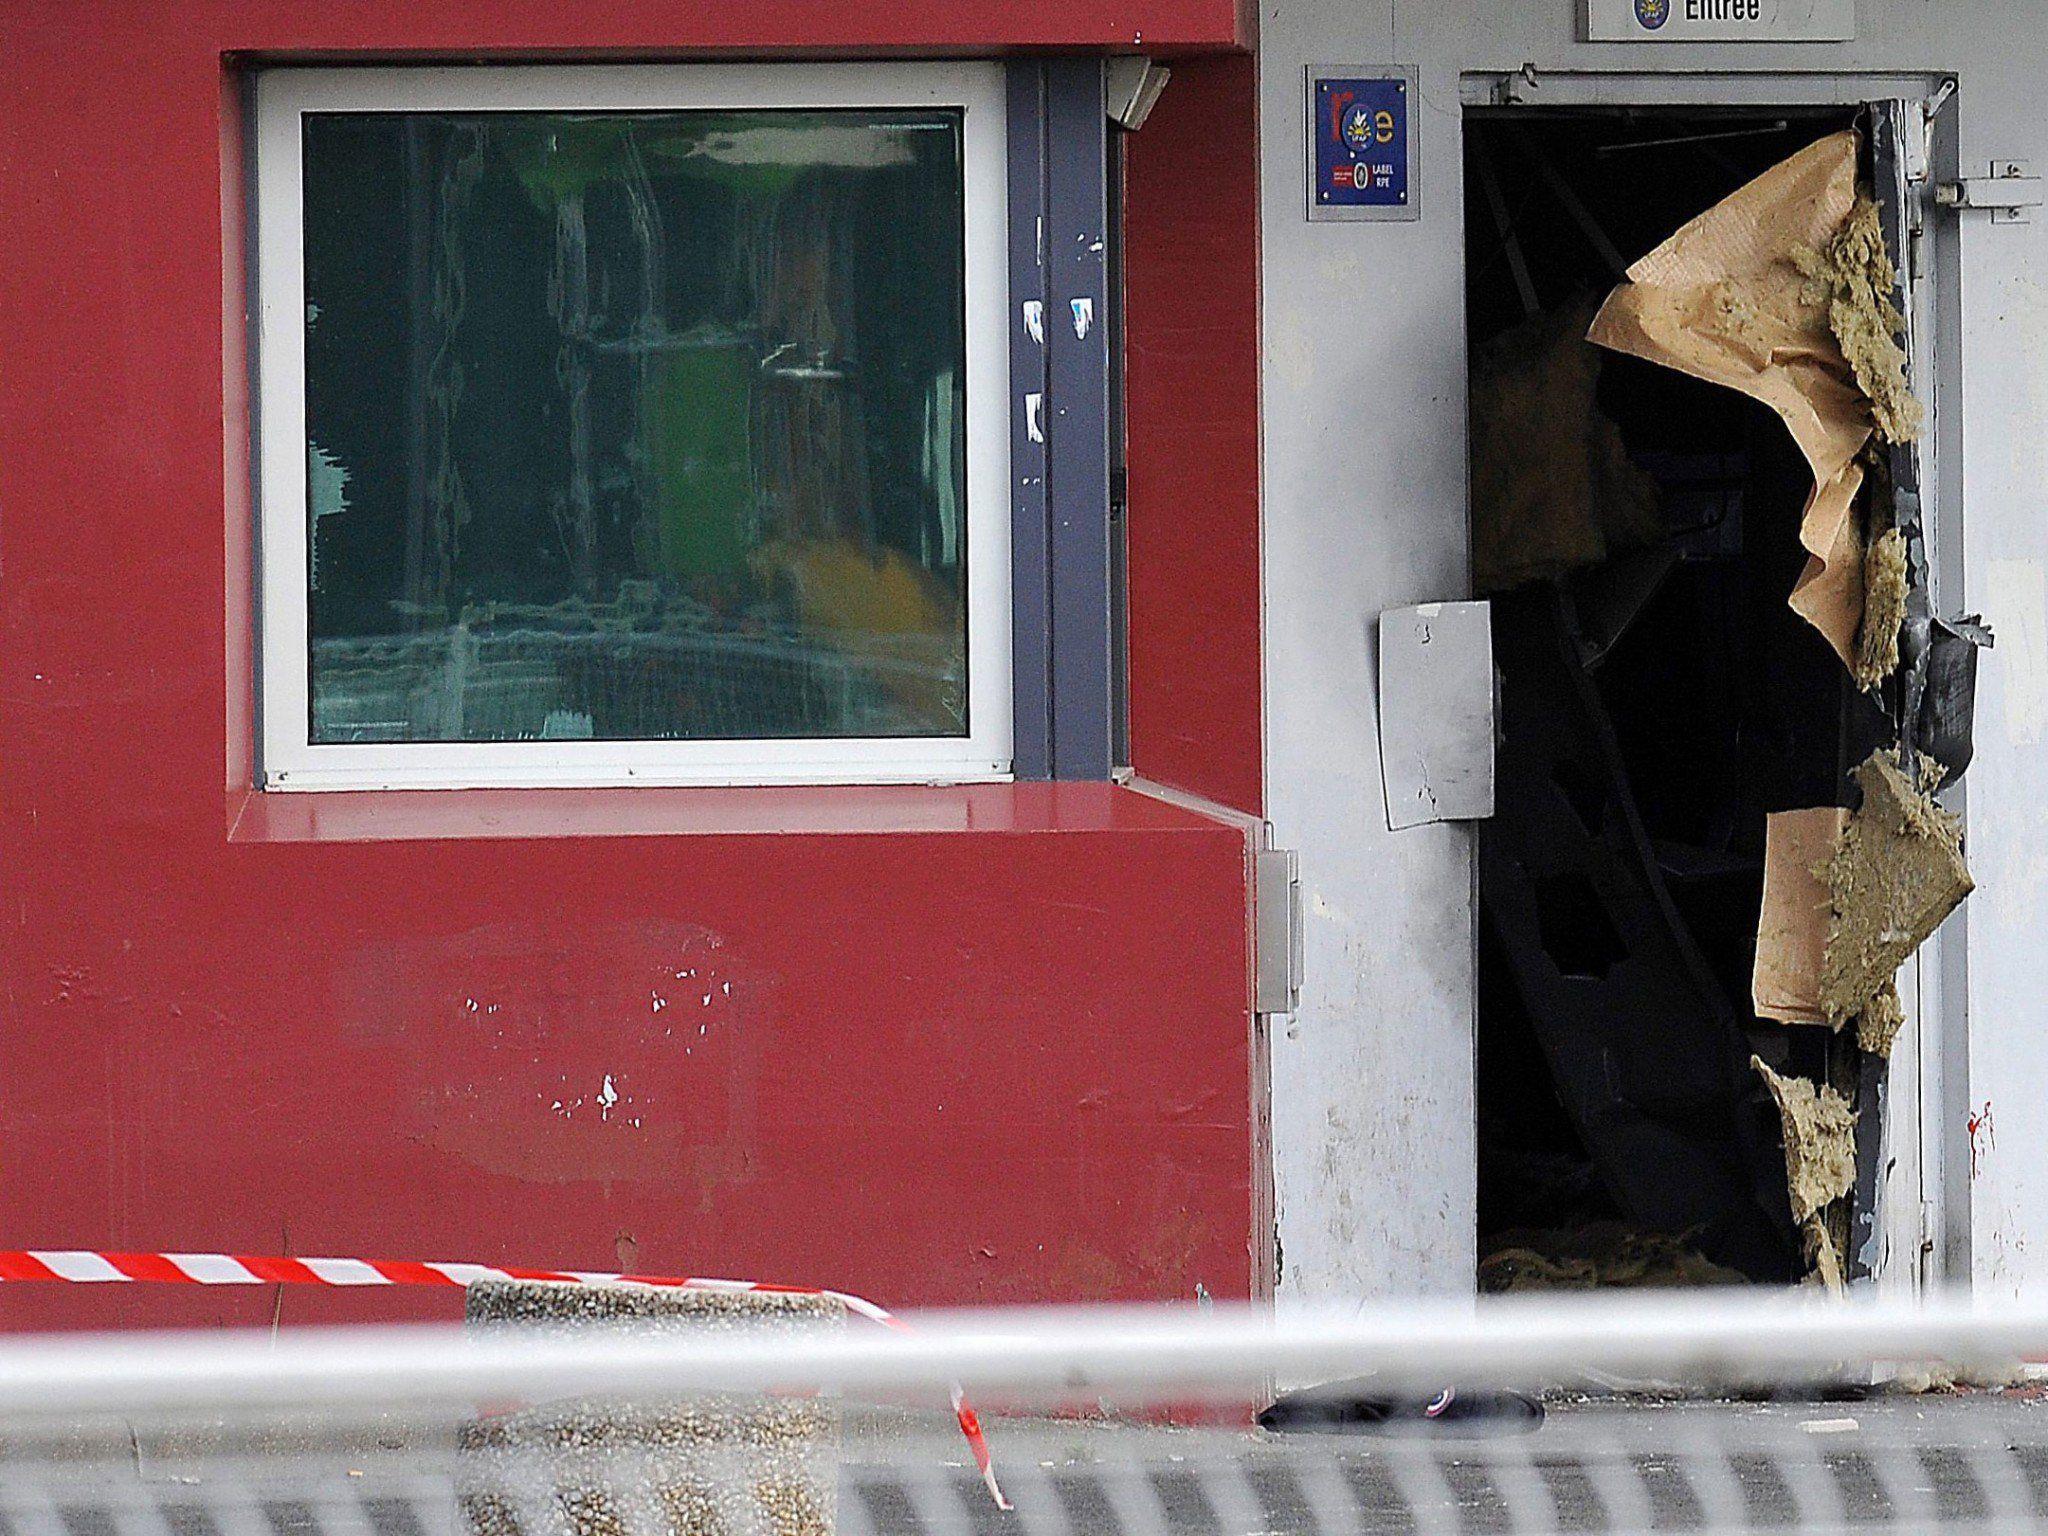 Spektakuläre Flucht: Sprengte mehrere Türen der Justizanstalt.